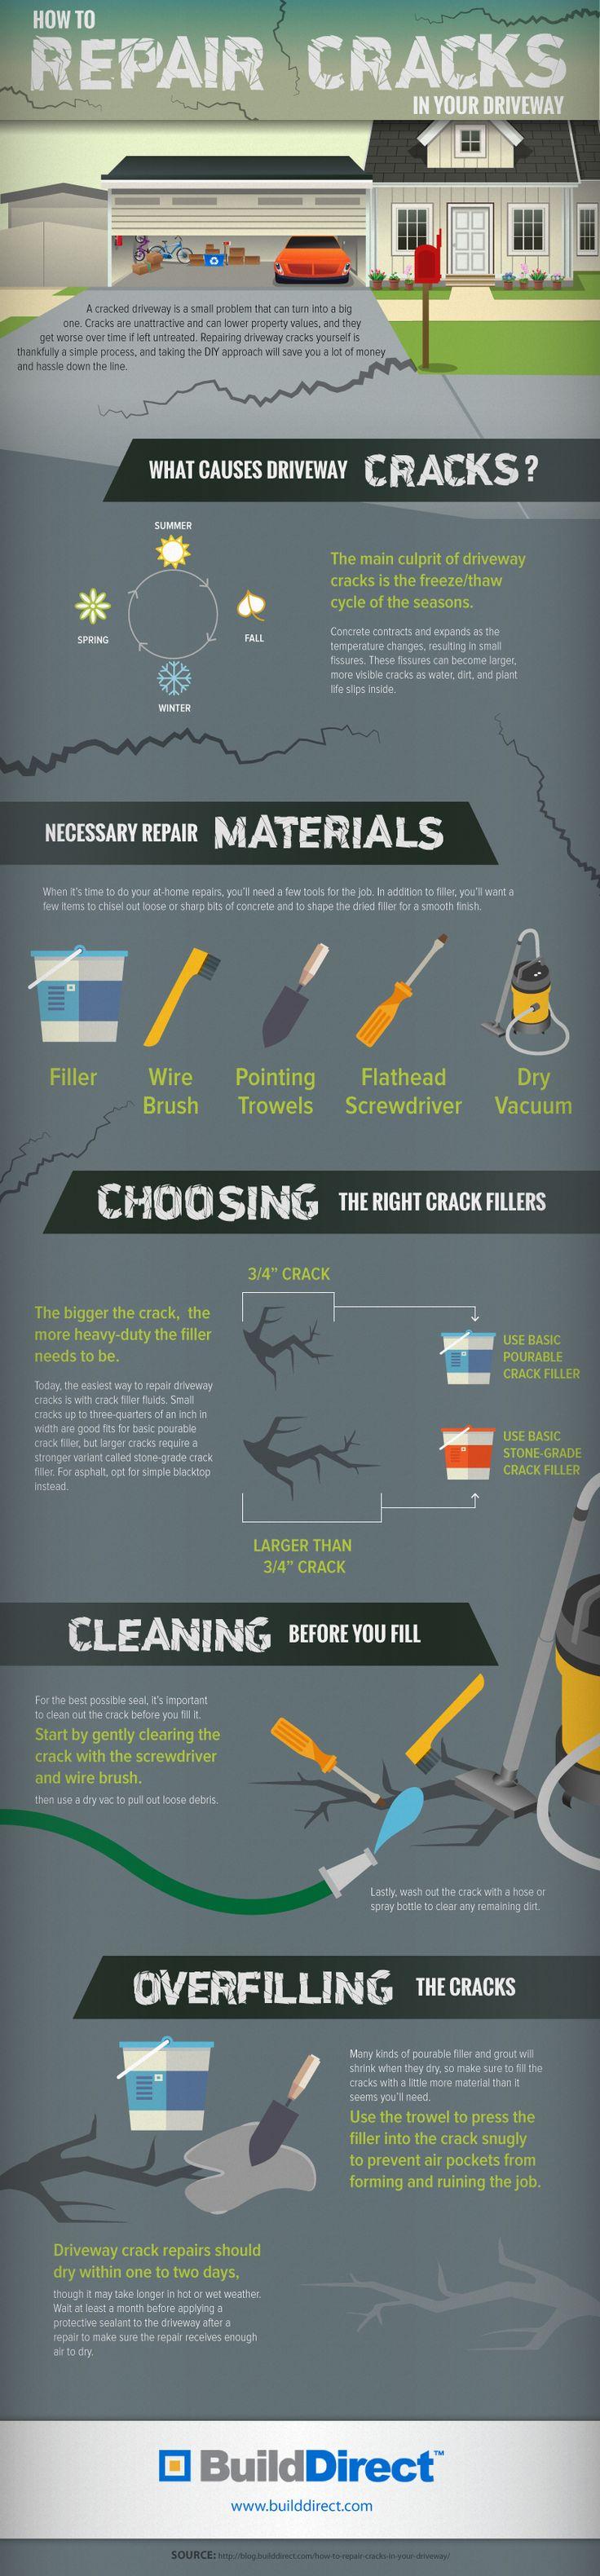 Driveway Repair: An Infographic